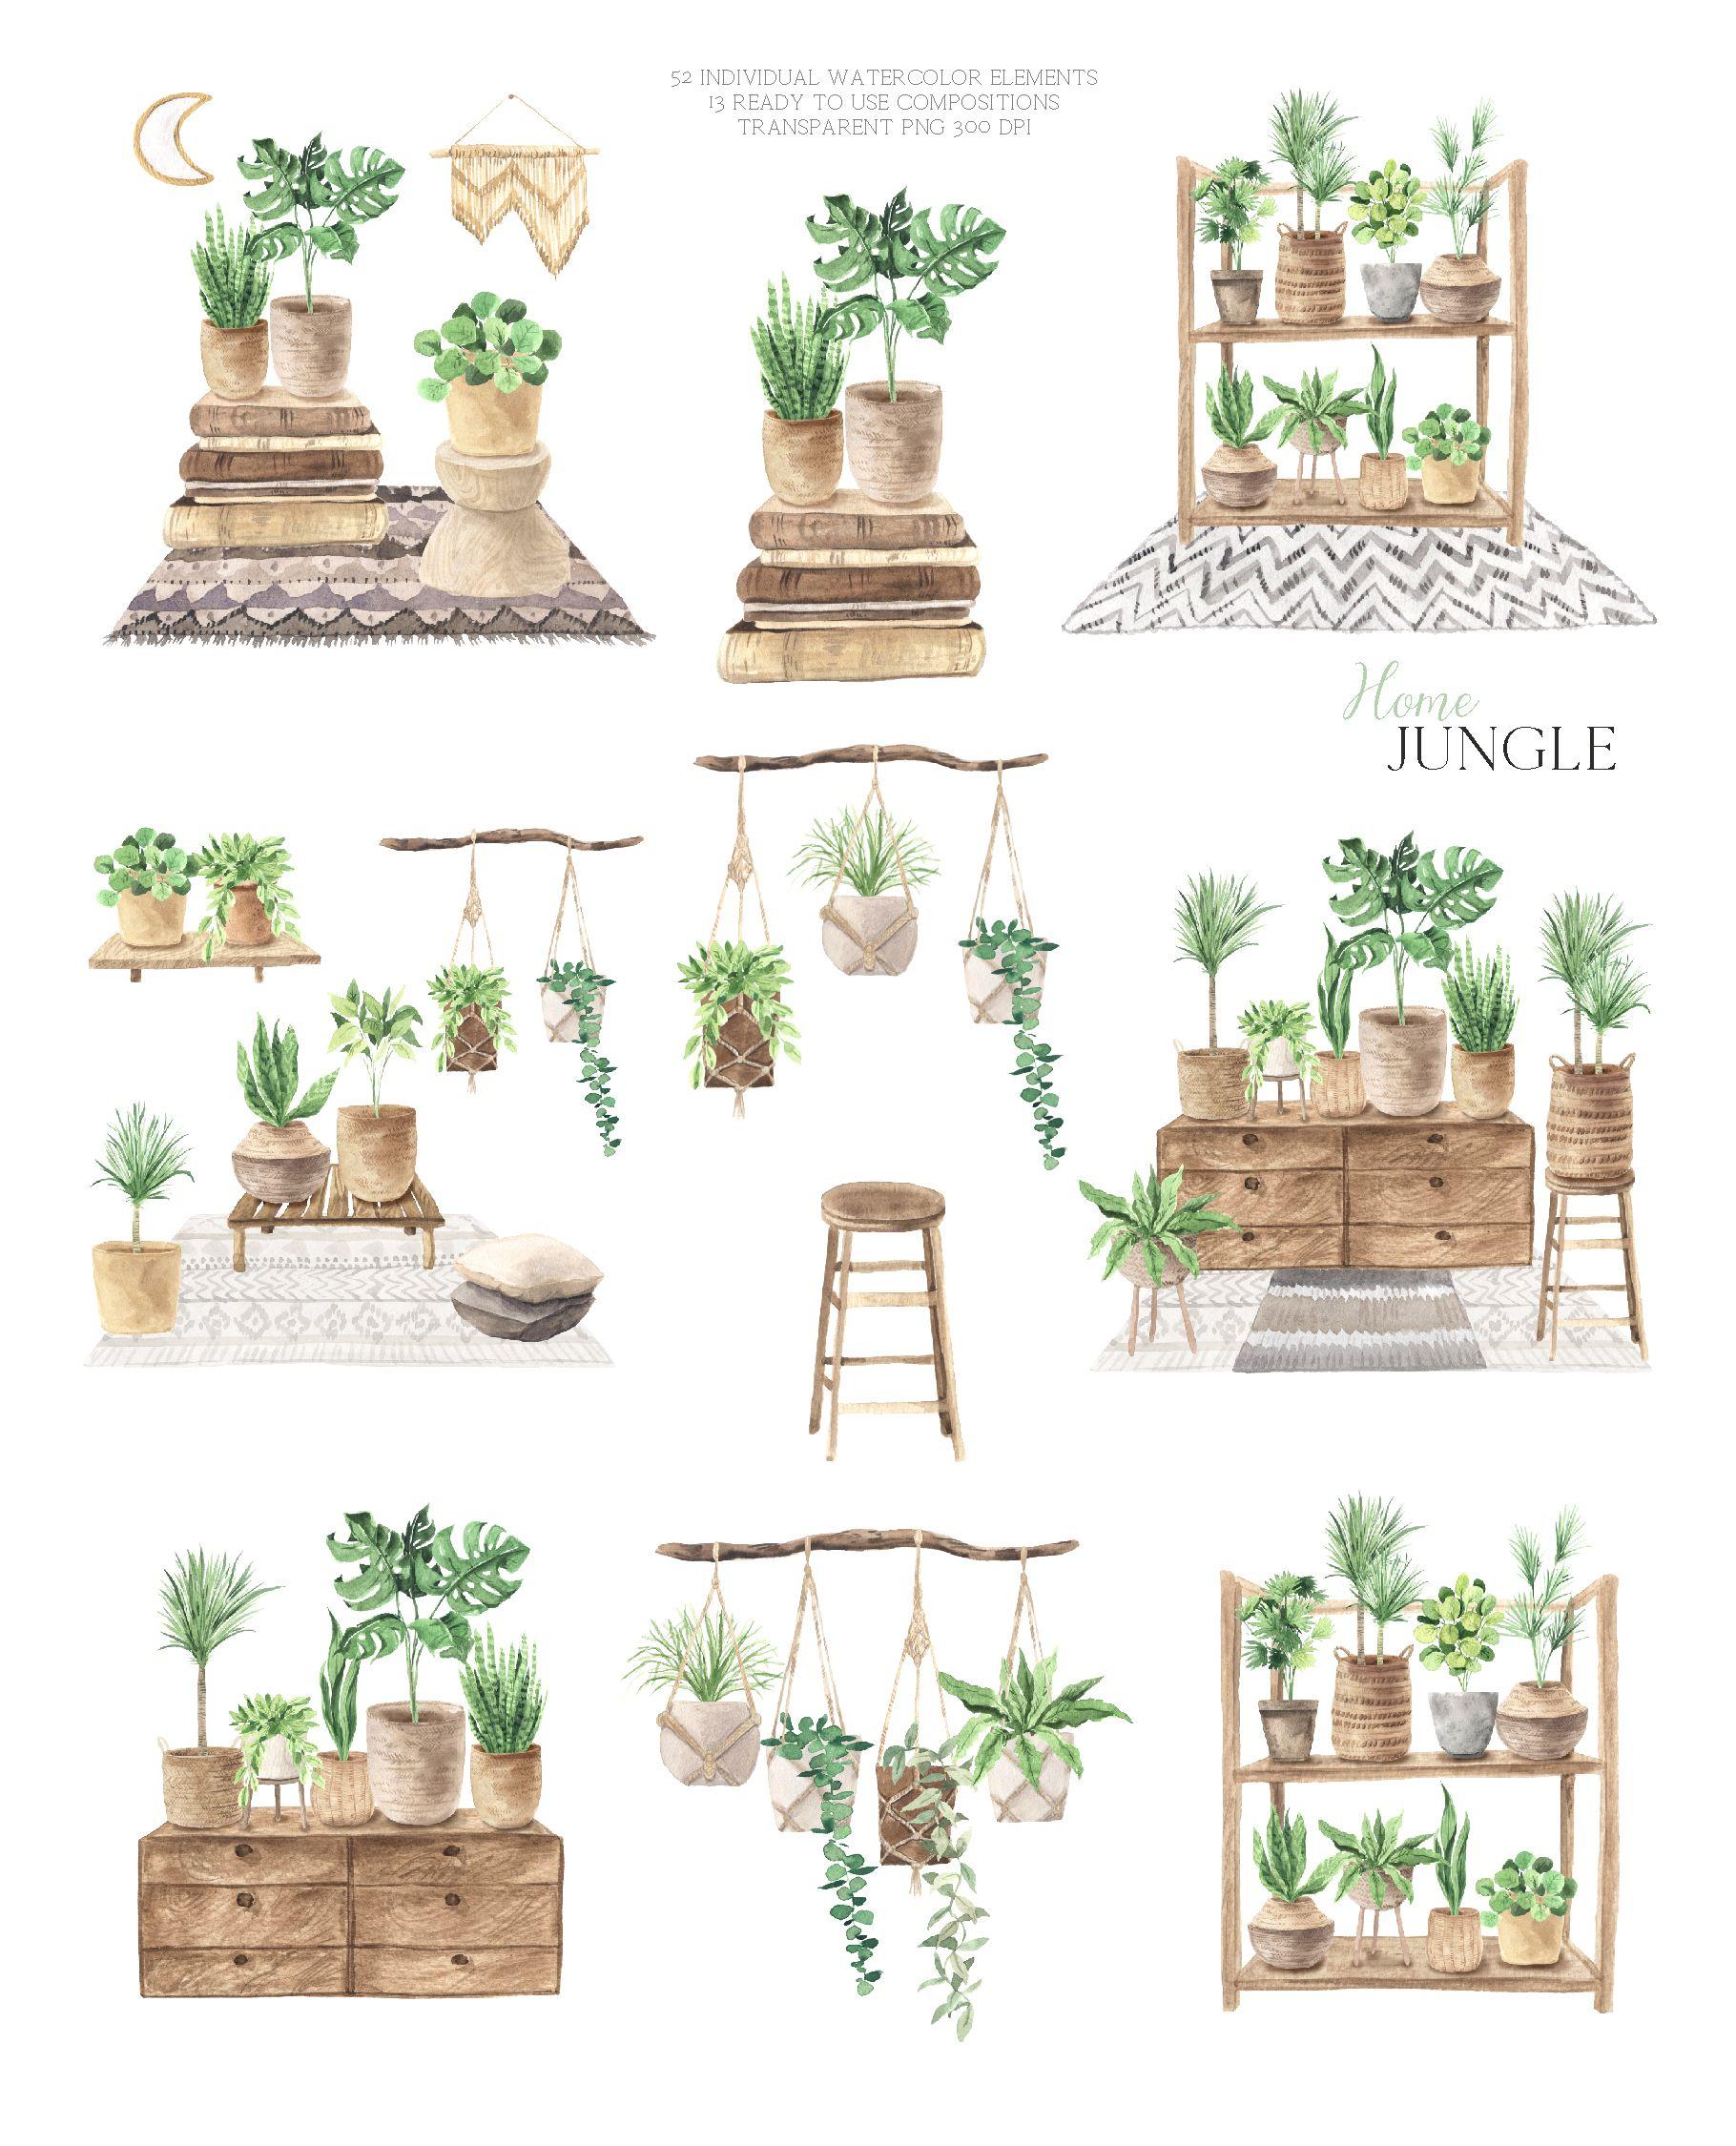 Boho Plant Home Clipart Watercolor House Potted Plant Png Etsy In 2021 Watercolor Plants House Clipart Watercolor